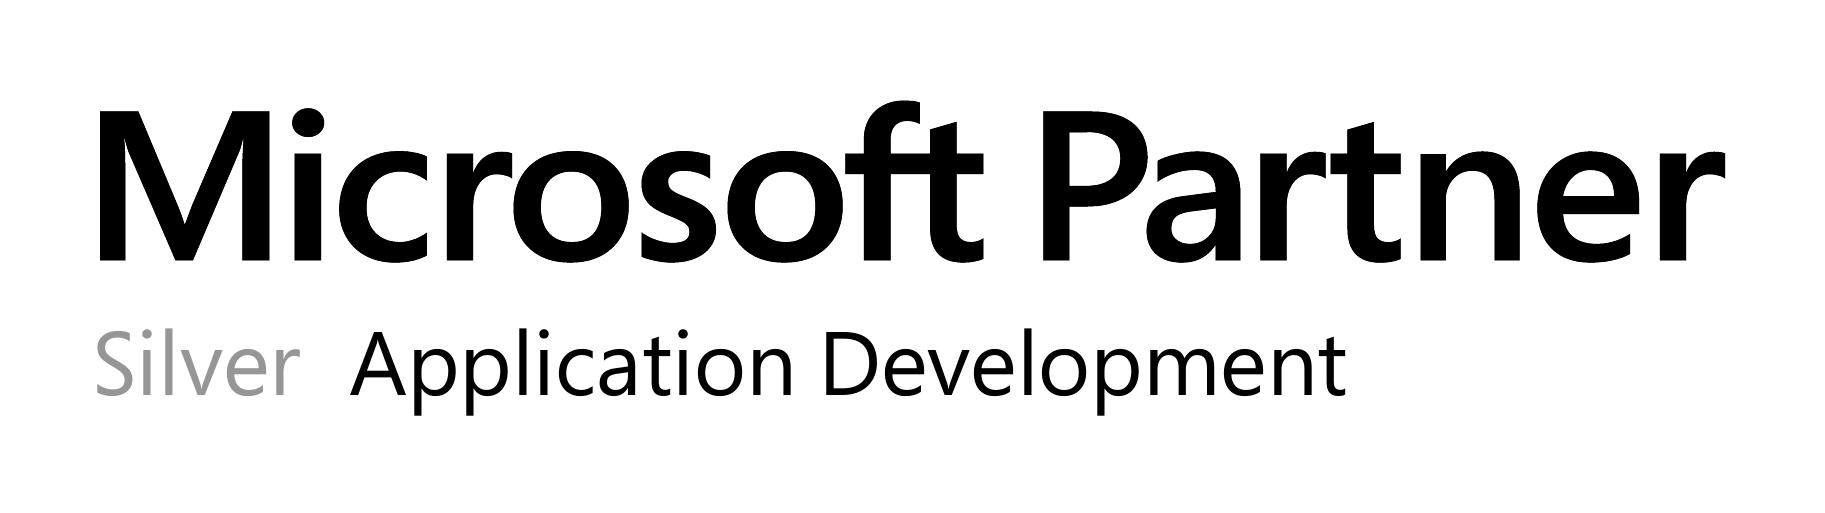 Microsoft Partner Official Logo